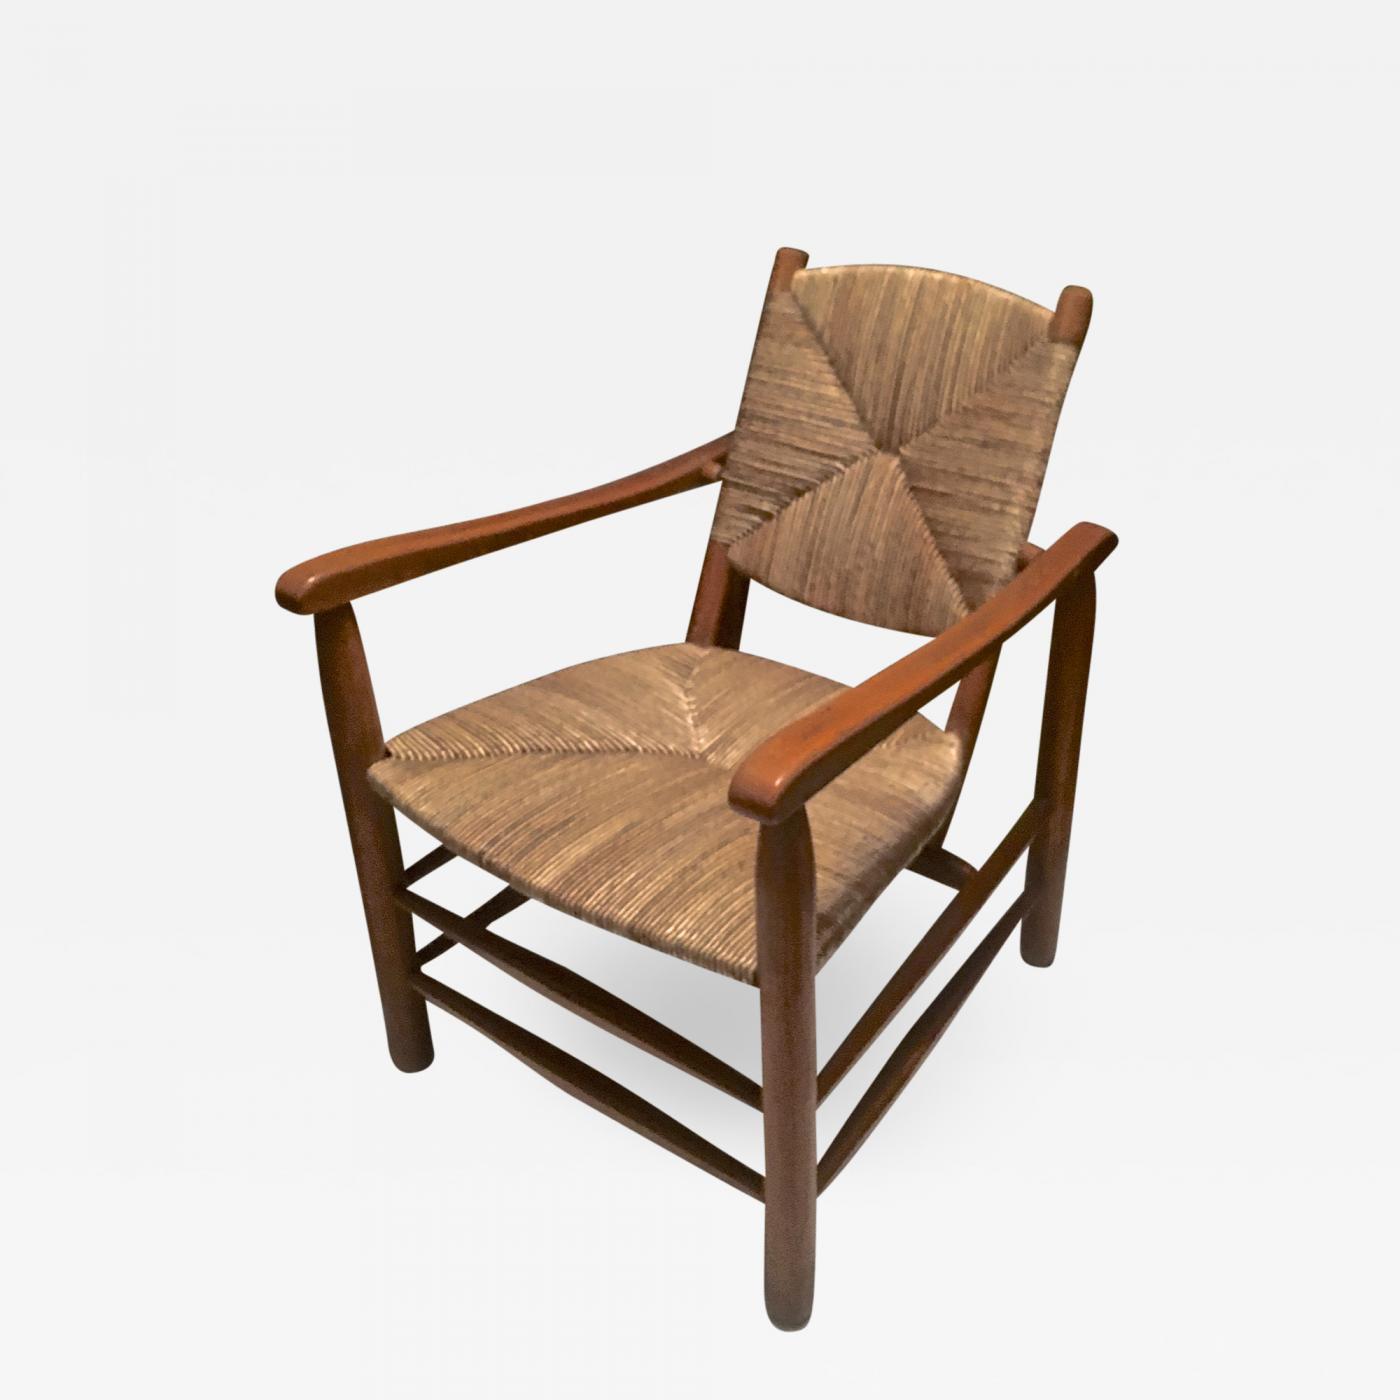 Peachy Charlotte Perriand Charlotte Perriand Iconic Rush Arm Chair Inzonedesignstudio Interior Chair Design Inzonedesignstudiocom